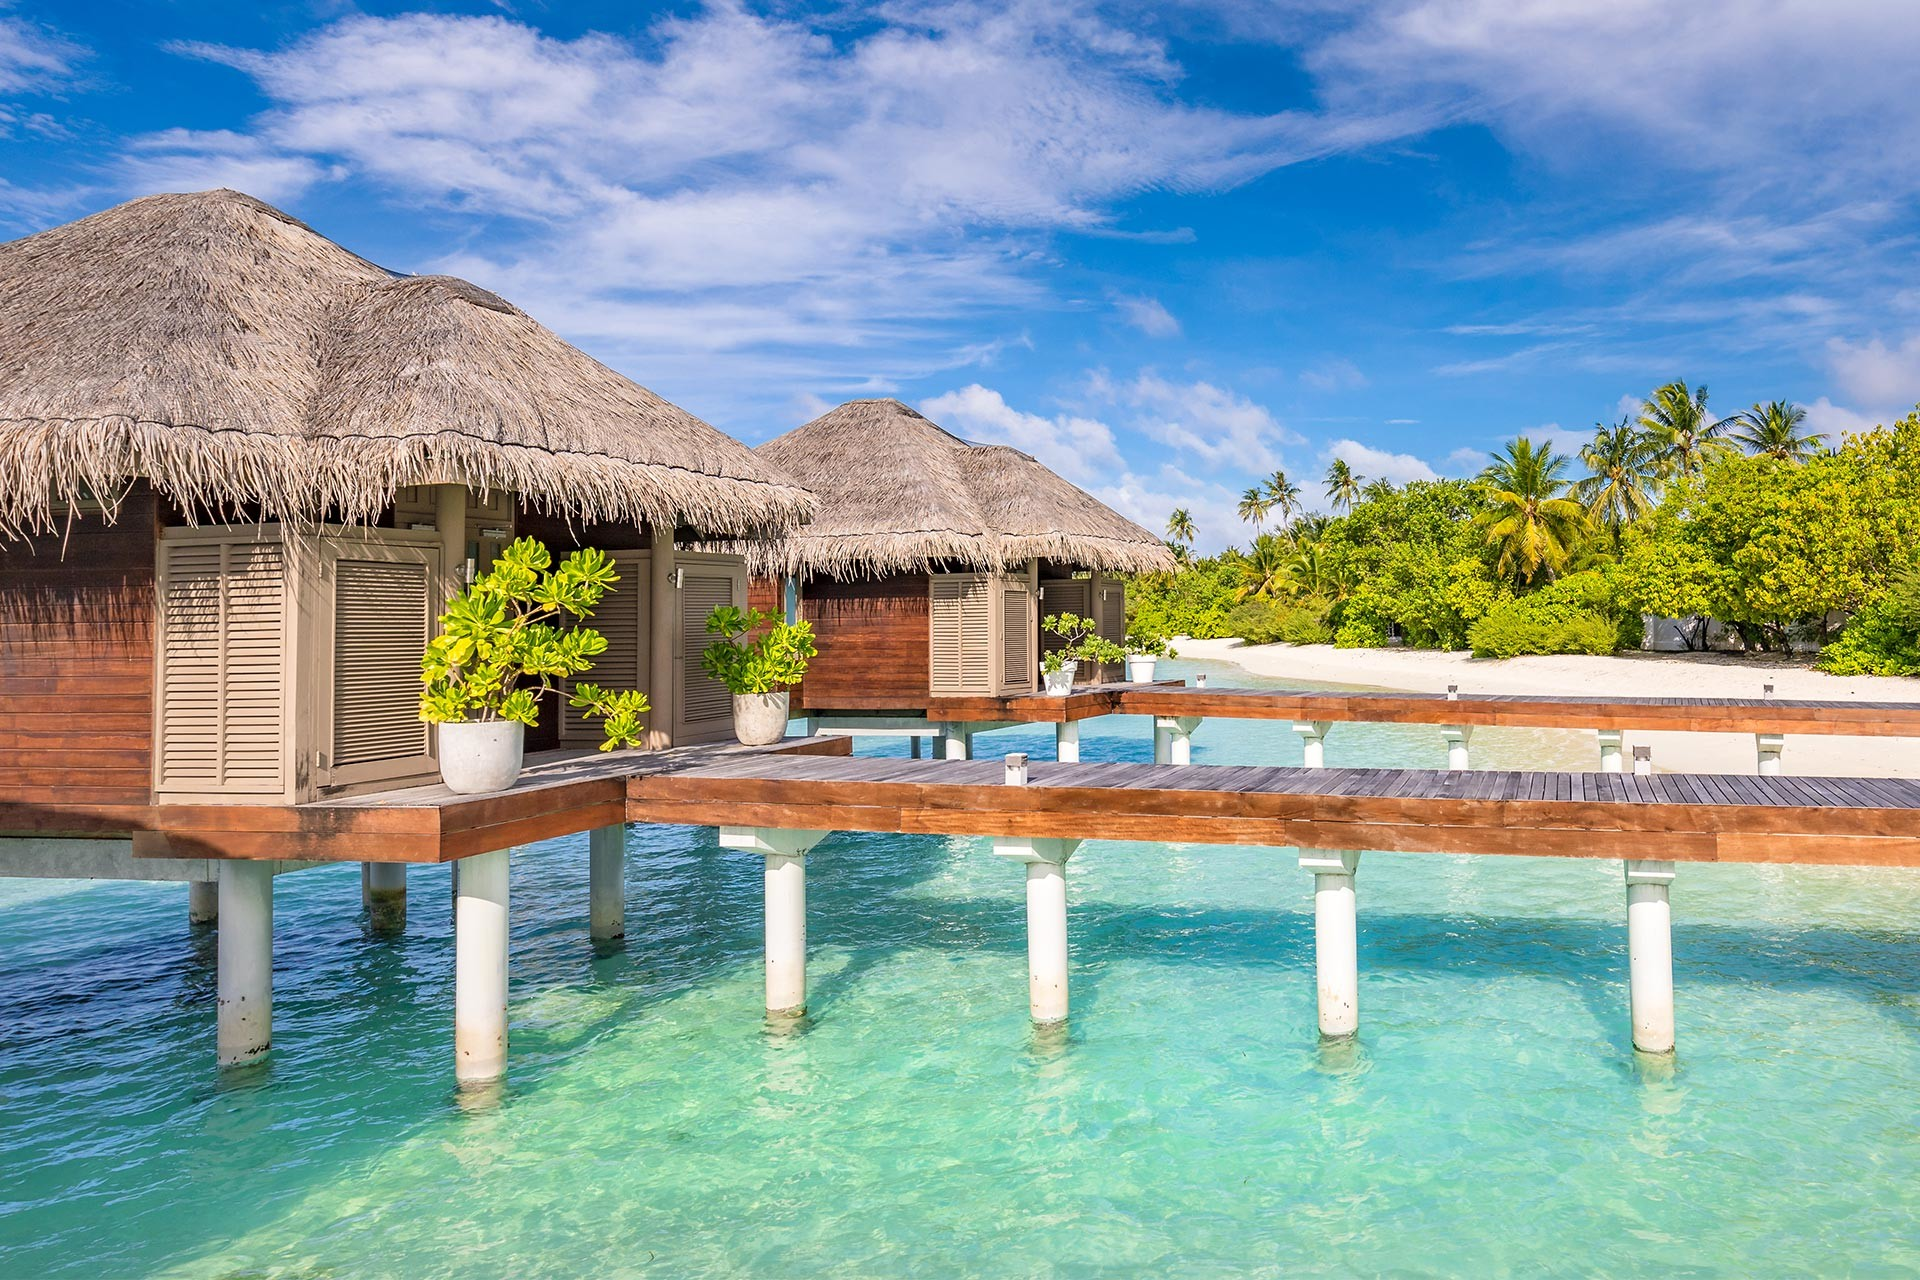 Sejur charter Maldive, 10 zile - 8 martie 2021